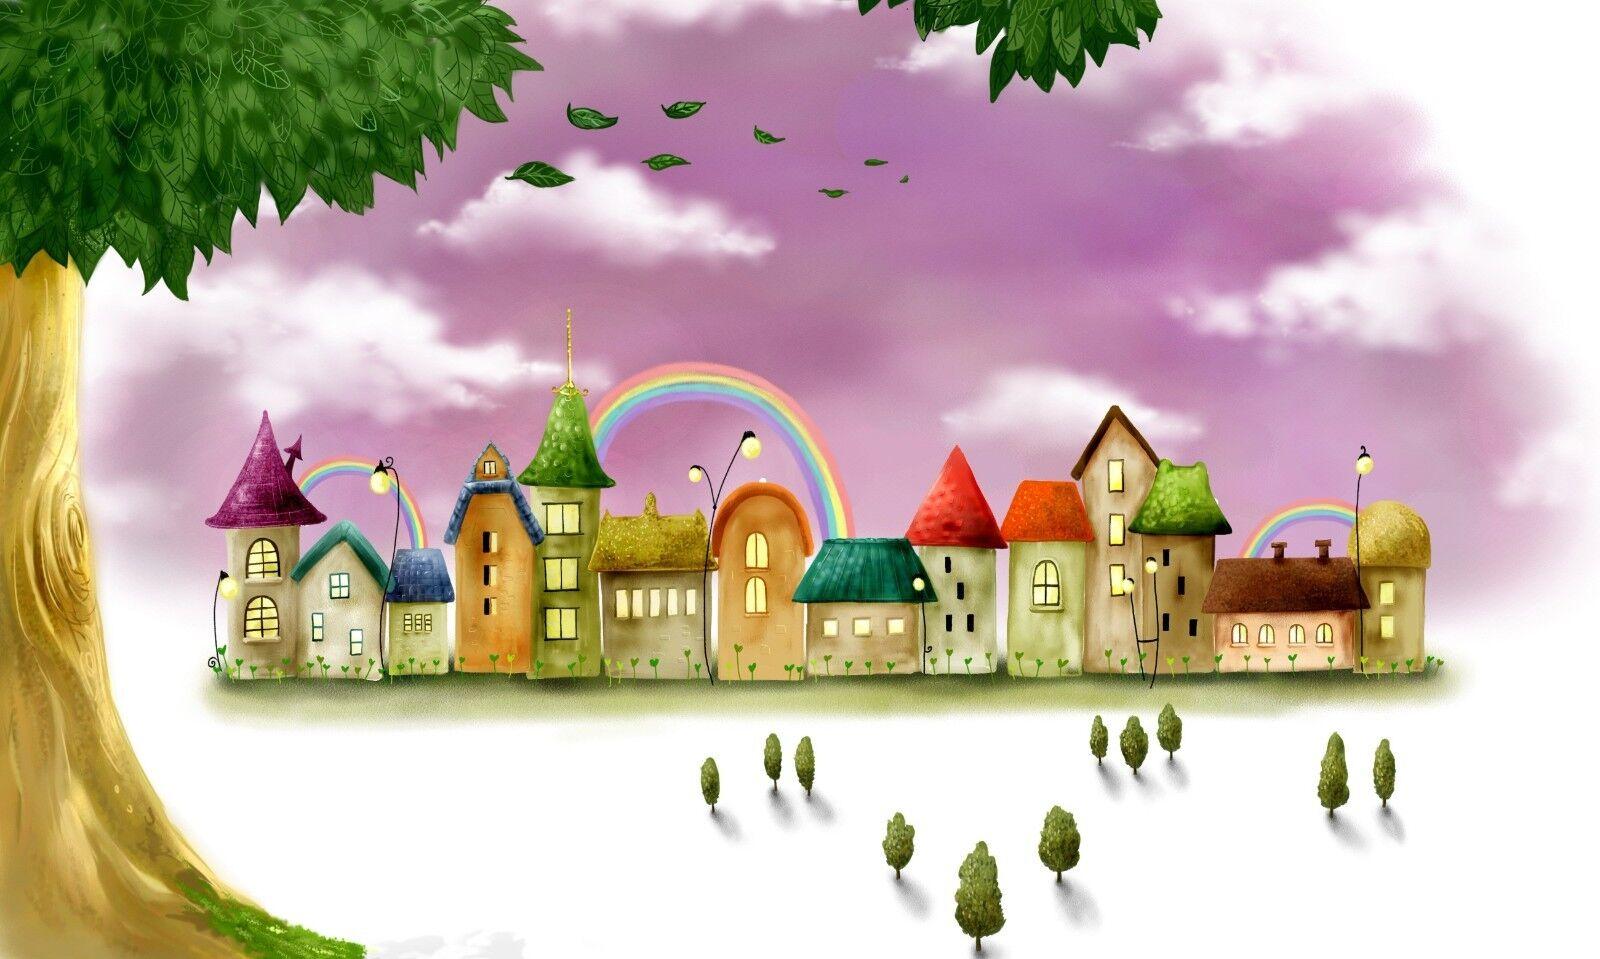 3D Graffiti Häuser Regenbogen 8 Tapete Wandgemälde Tapeten Bild Familie Familie Familie DE Lemon  | Neuankömmling  | Gemäßigten Kosten  | Gutes Design  230850